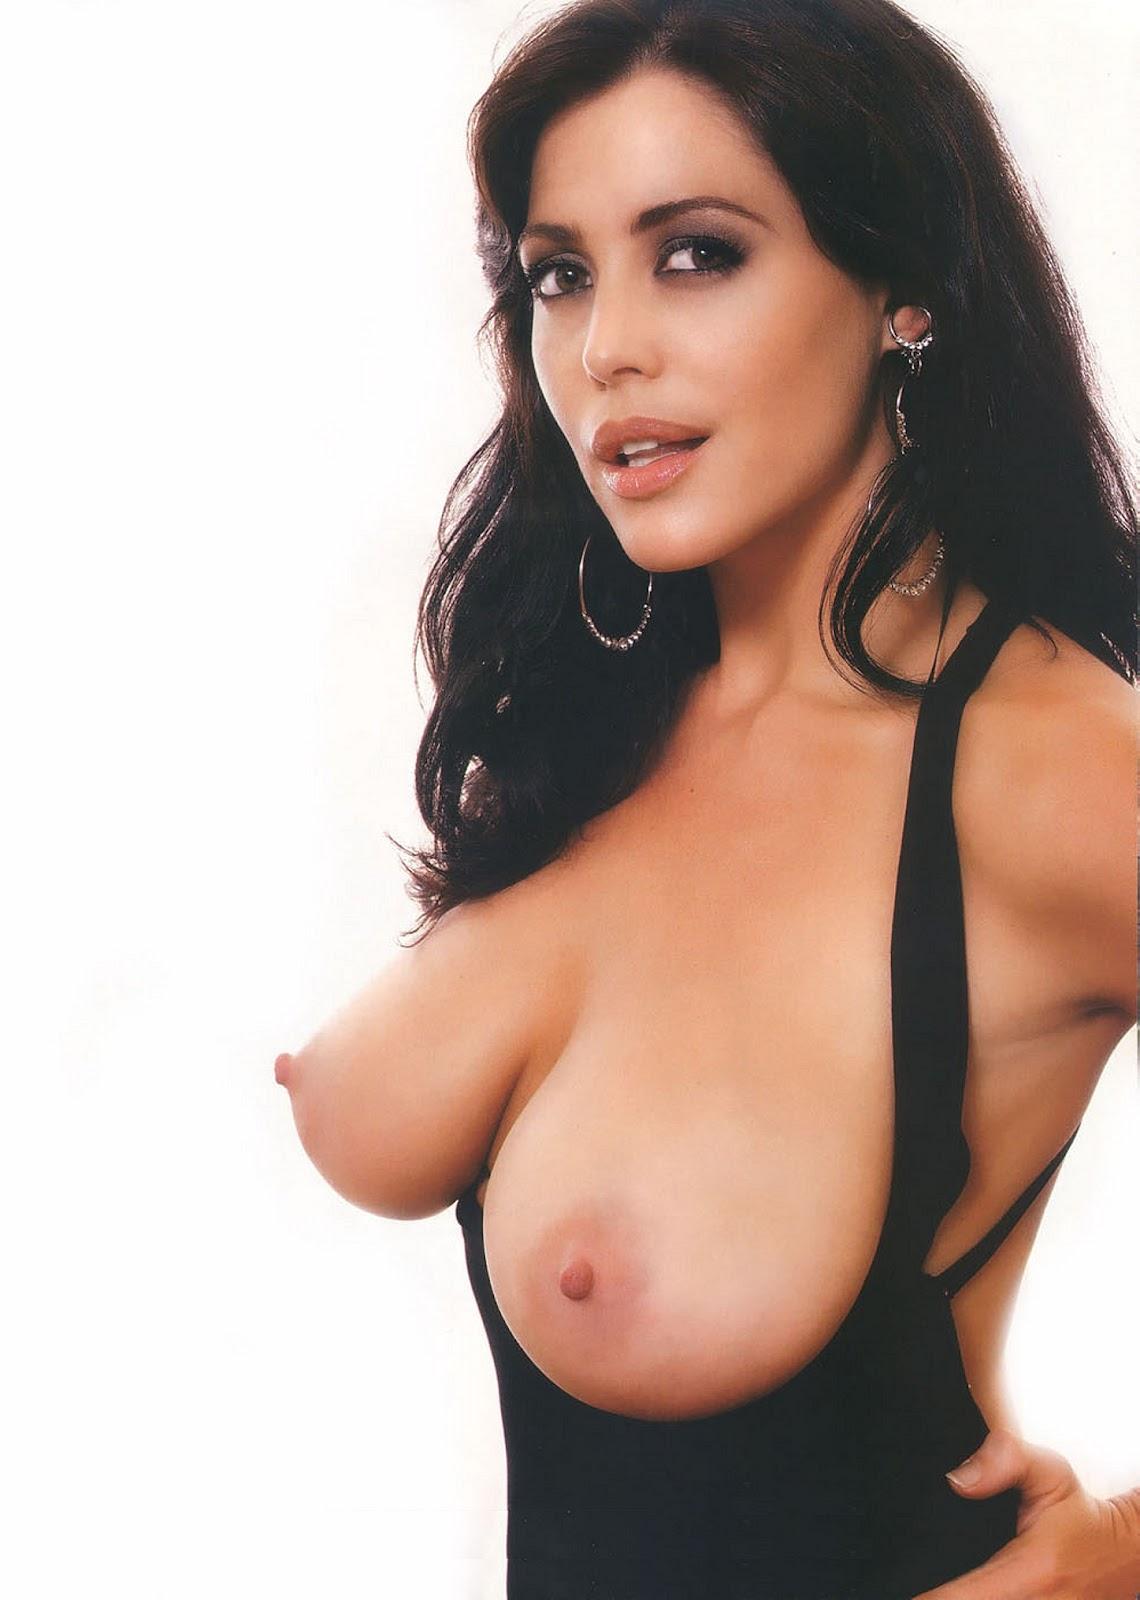 terri wilson nude pic